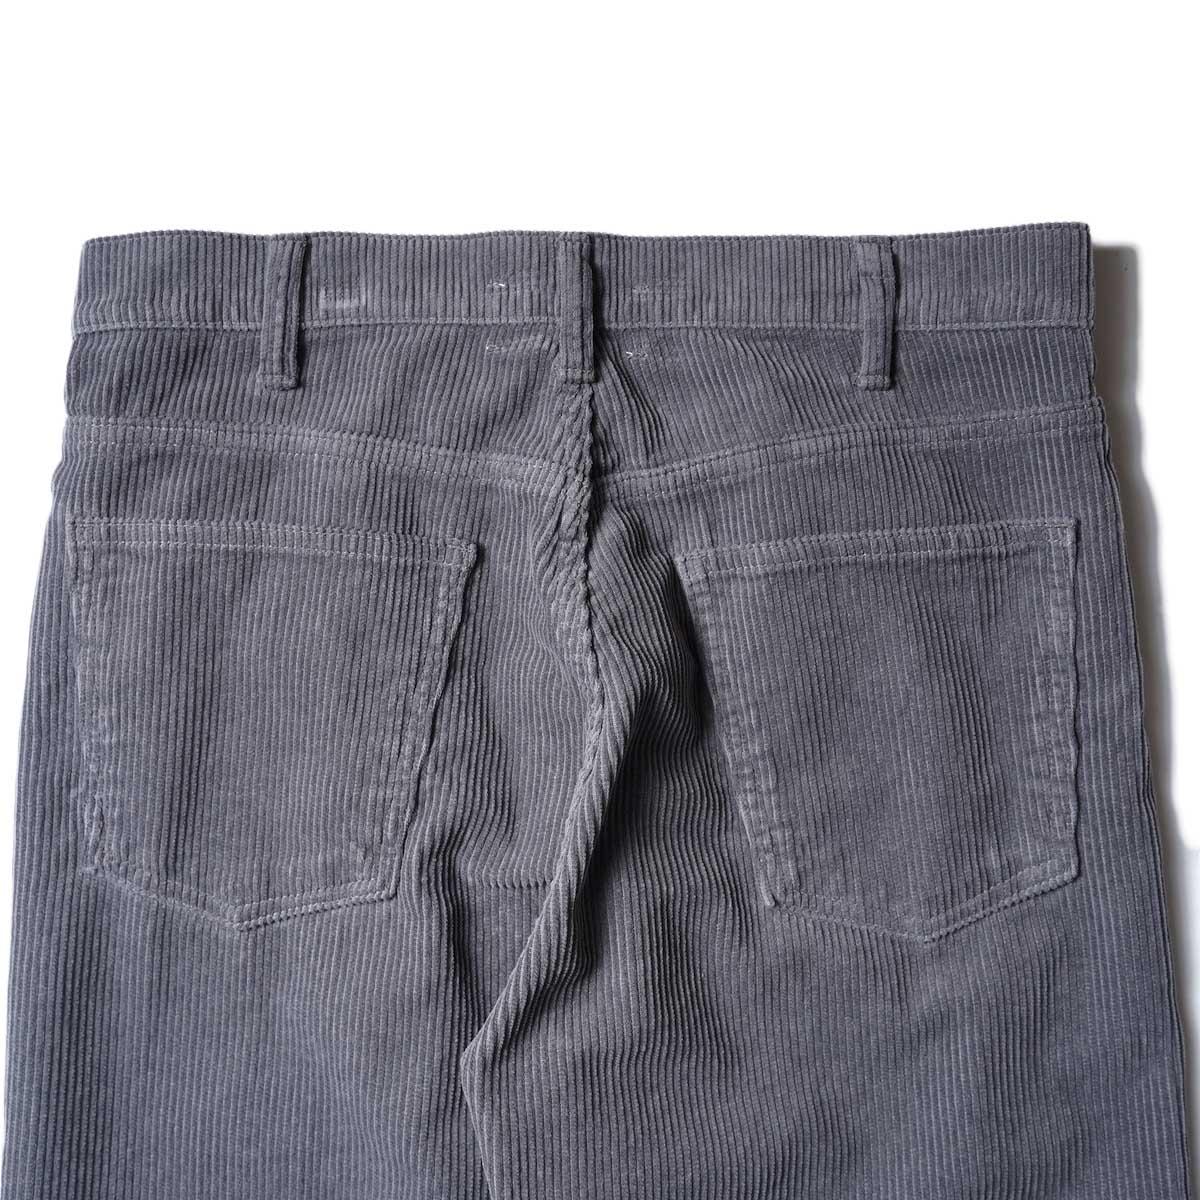 UNUSED / UW0982 CORDUROY PANTS (Gray) ヒップポケット